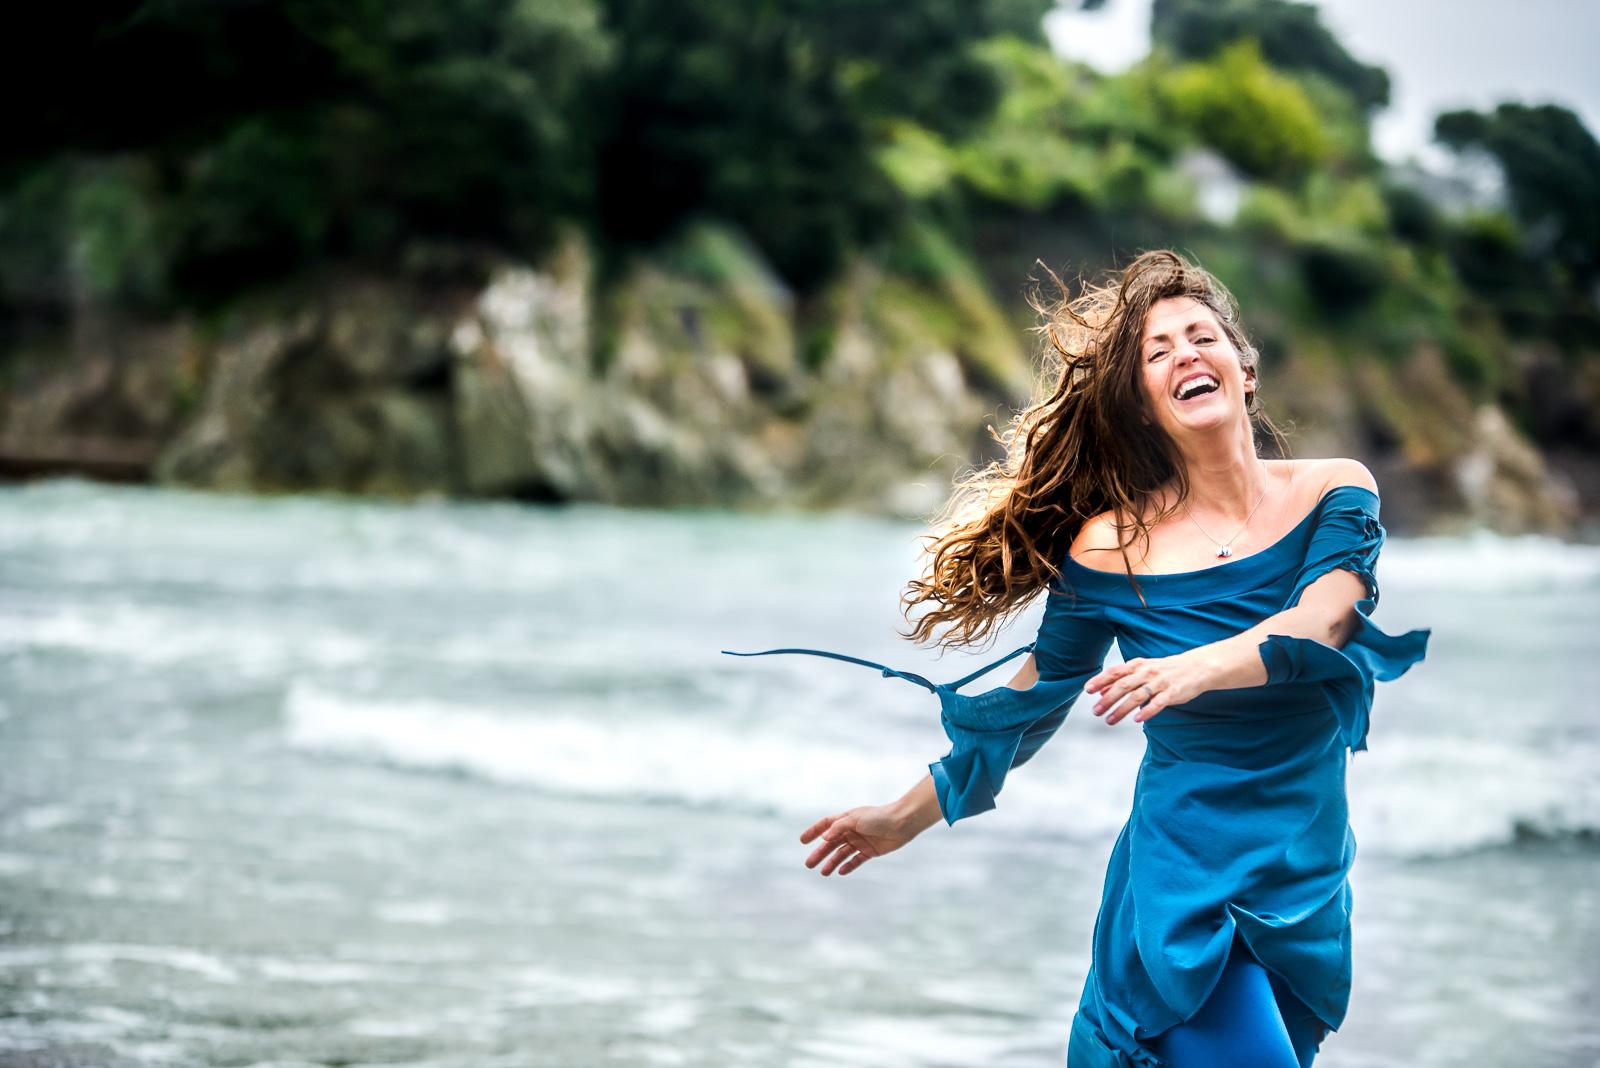 Professional Commercial Portrait Photographer, Magdalena Smolarska Photography based in Brighton, London, Devon, UK